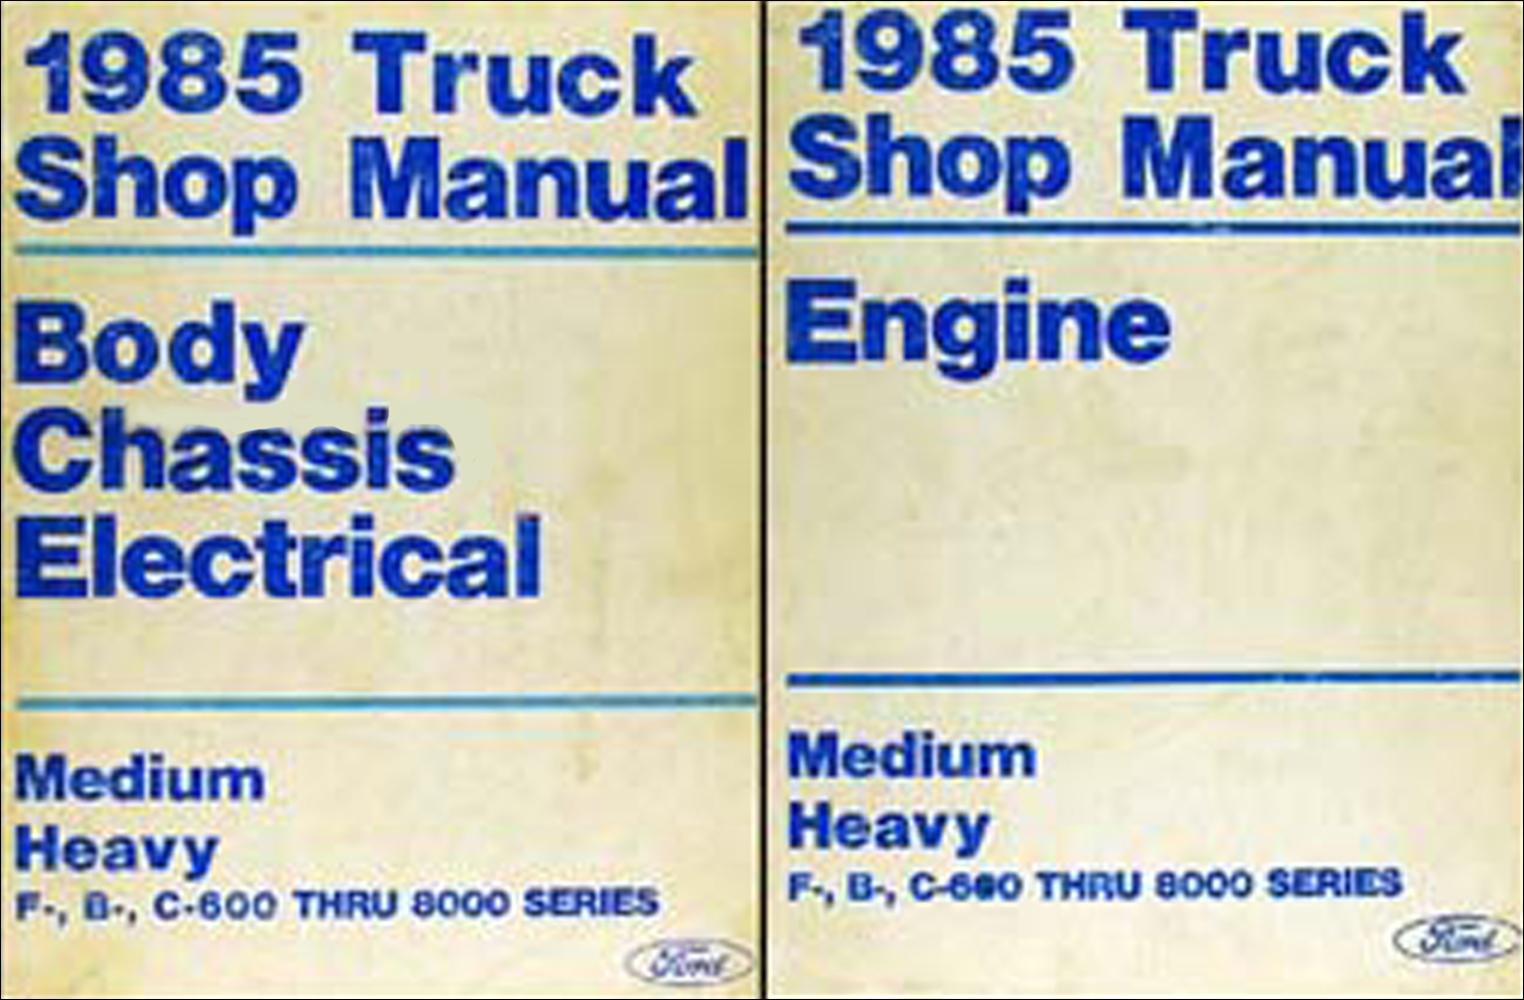 1985 Ford F800 Wiring Diagram Schematics Alternator Diagrams 1991 F600 Truck F B C 600 8000 Medium And Heavy Repair Shop Manual Set